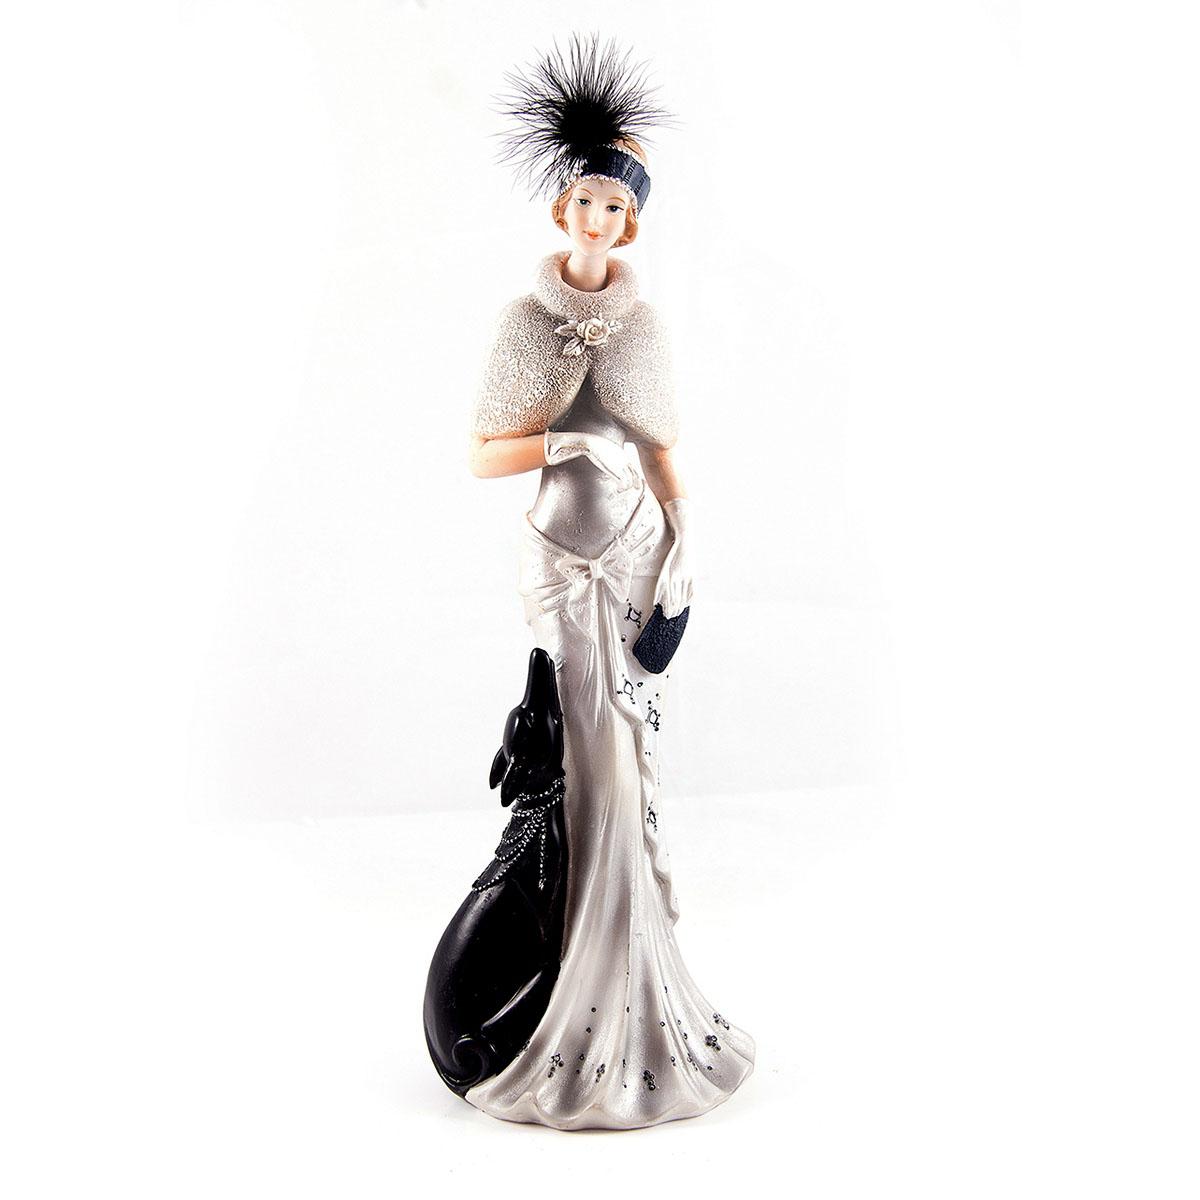 Статуэтка Русские Подарки Мисс Рандеву, 11 х 10 х 31 см статуэтка русские подарки африканка 6 х 11 х 20 см